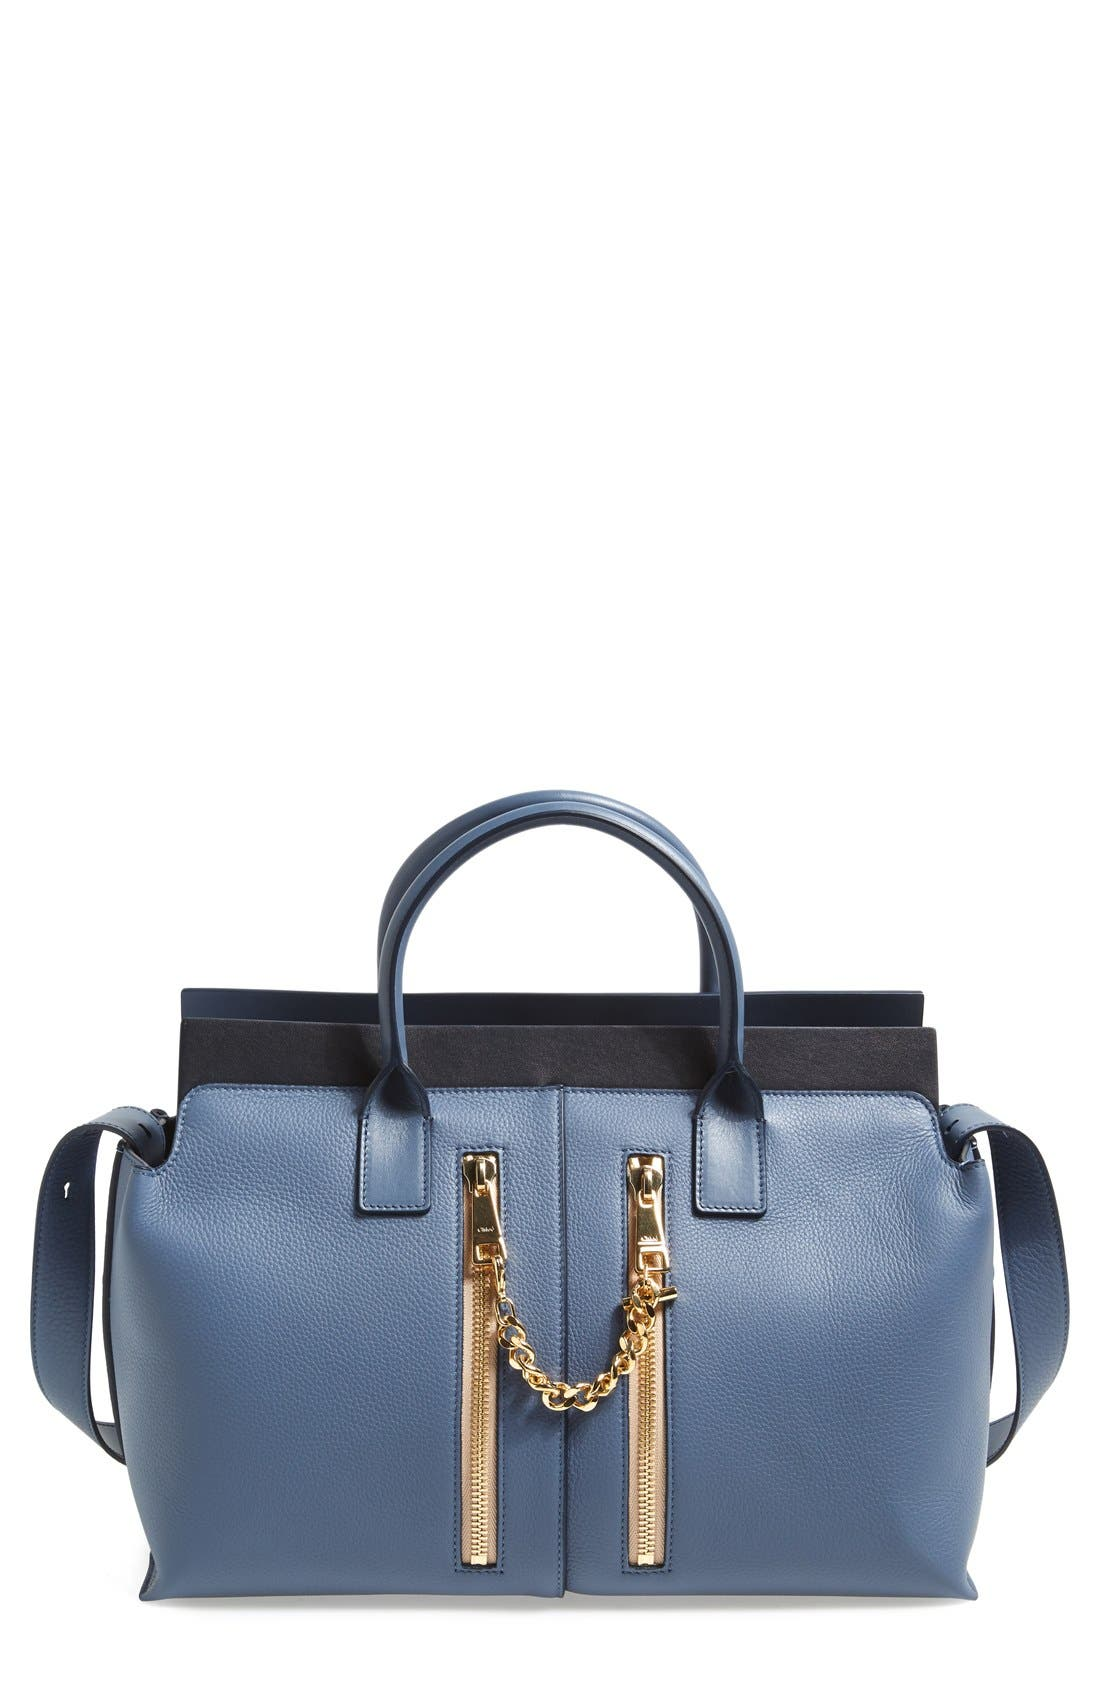 Alternate Image 1 Selected - Chloé 'Cate - Medium' Leather Satchel